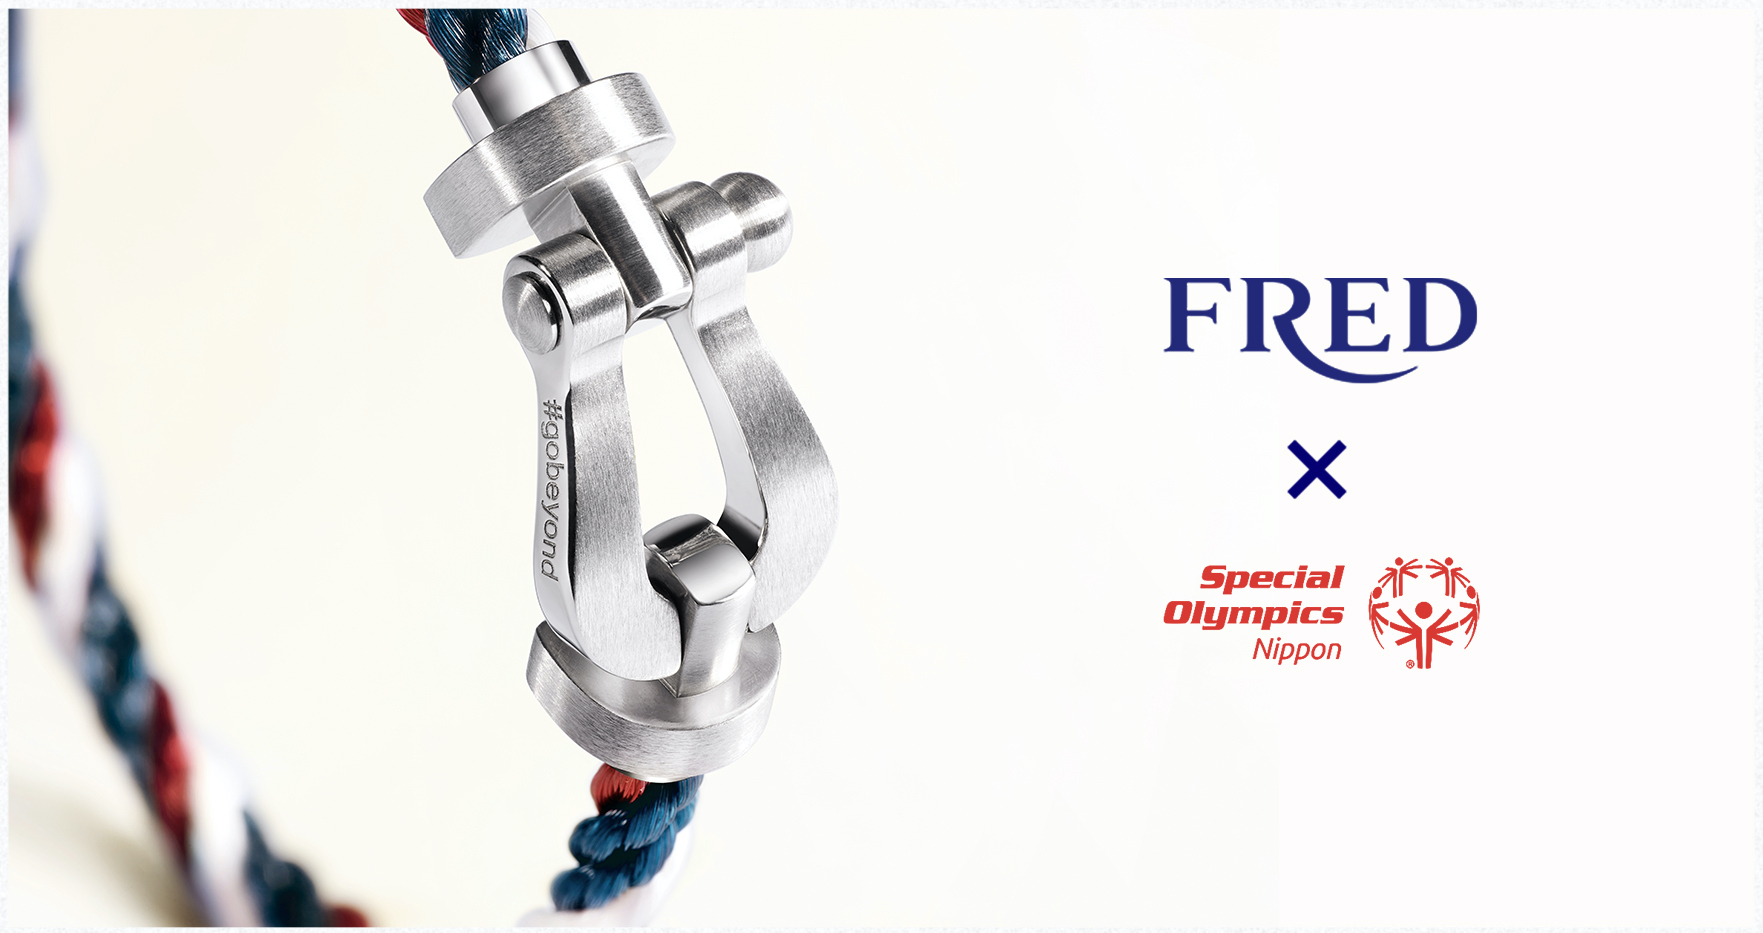 FRED、アイコンコレクション「フォース 10」から新作発売